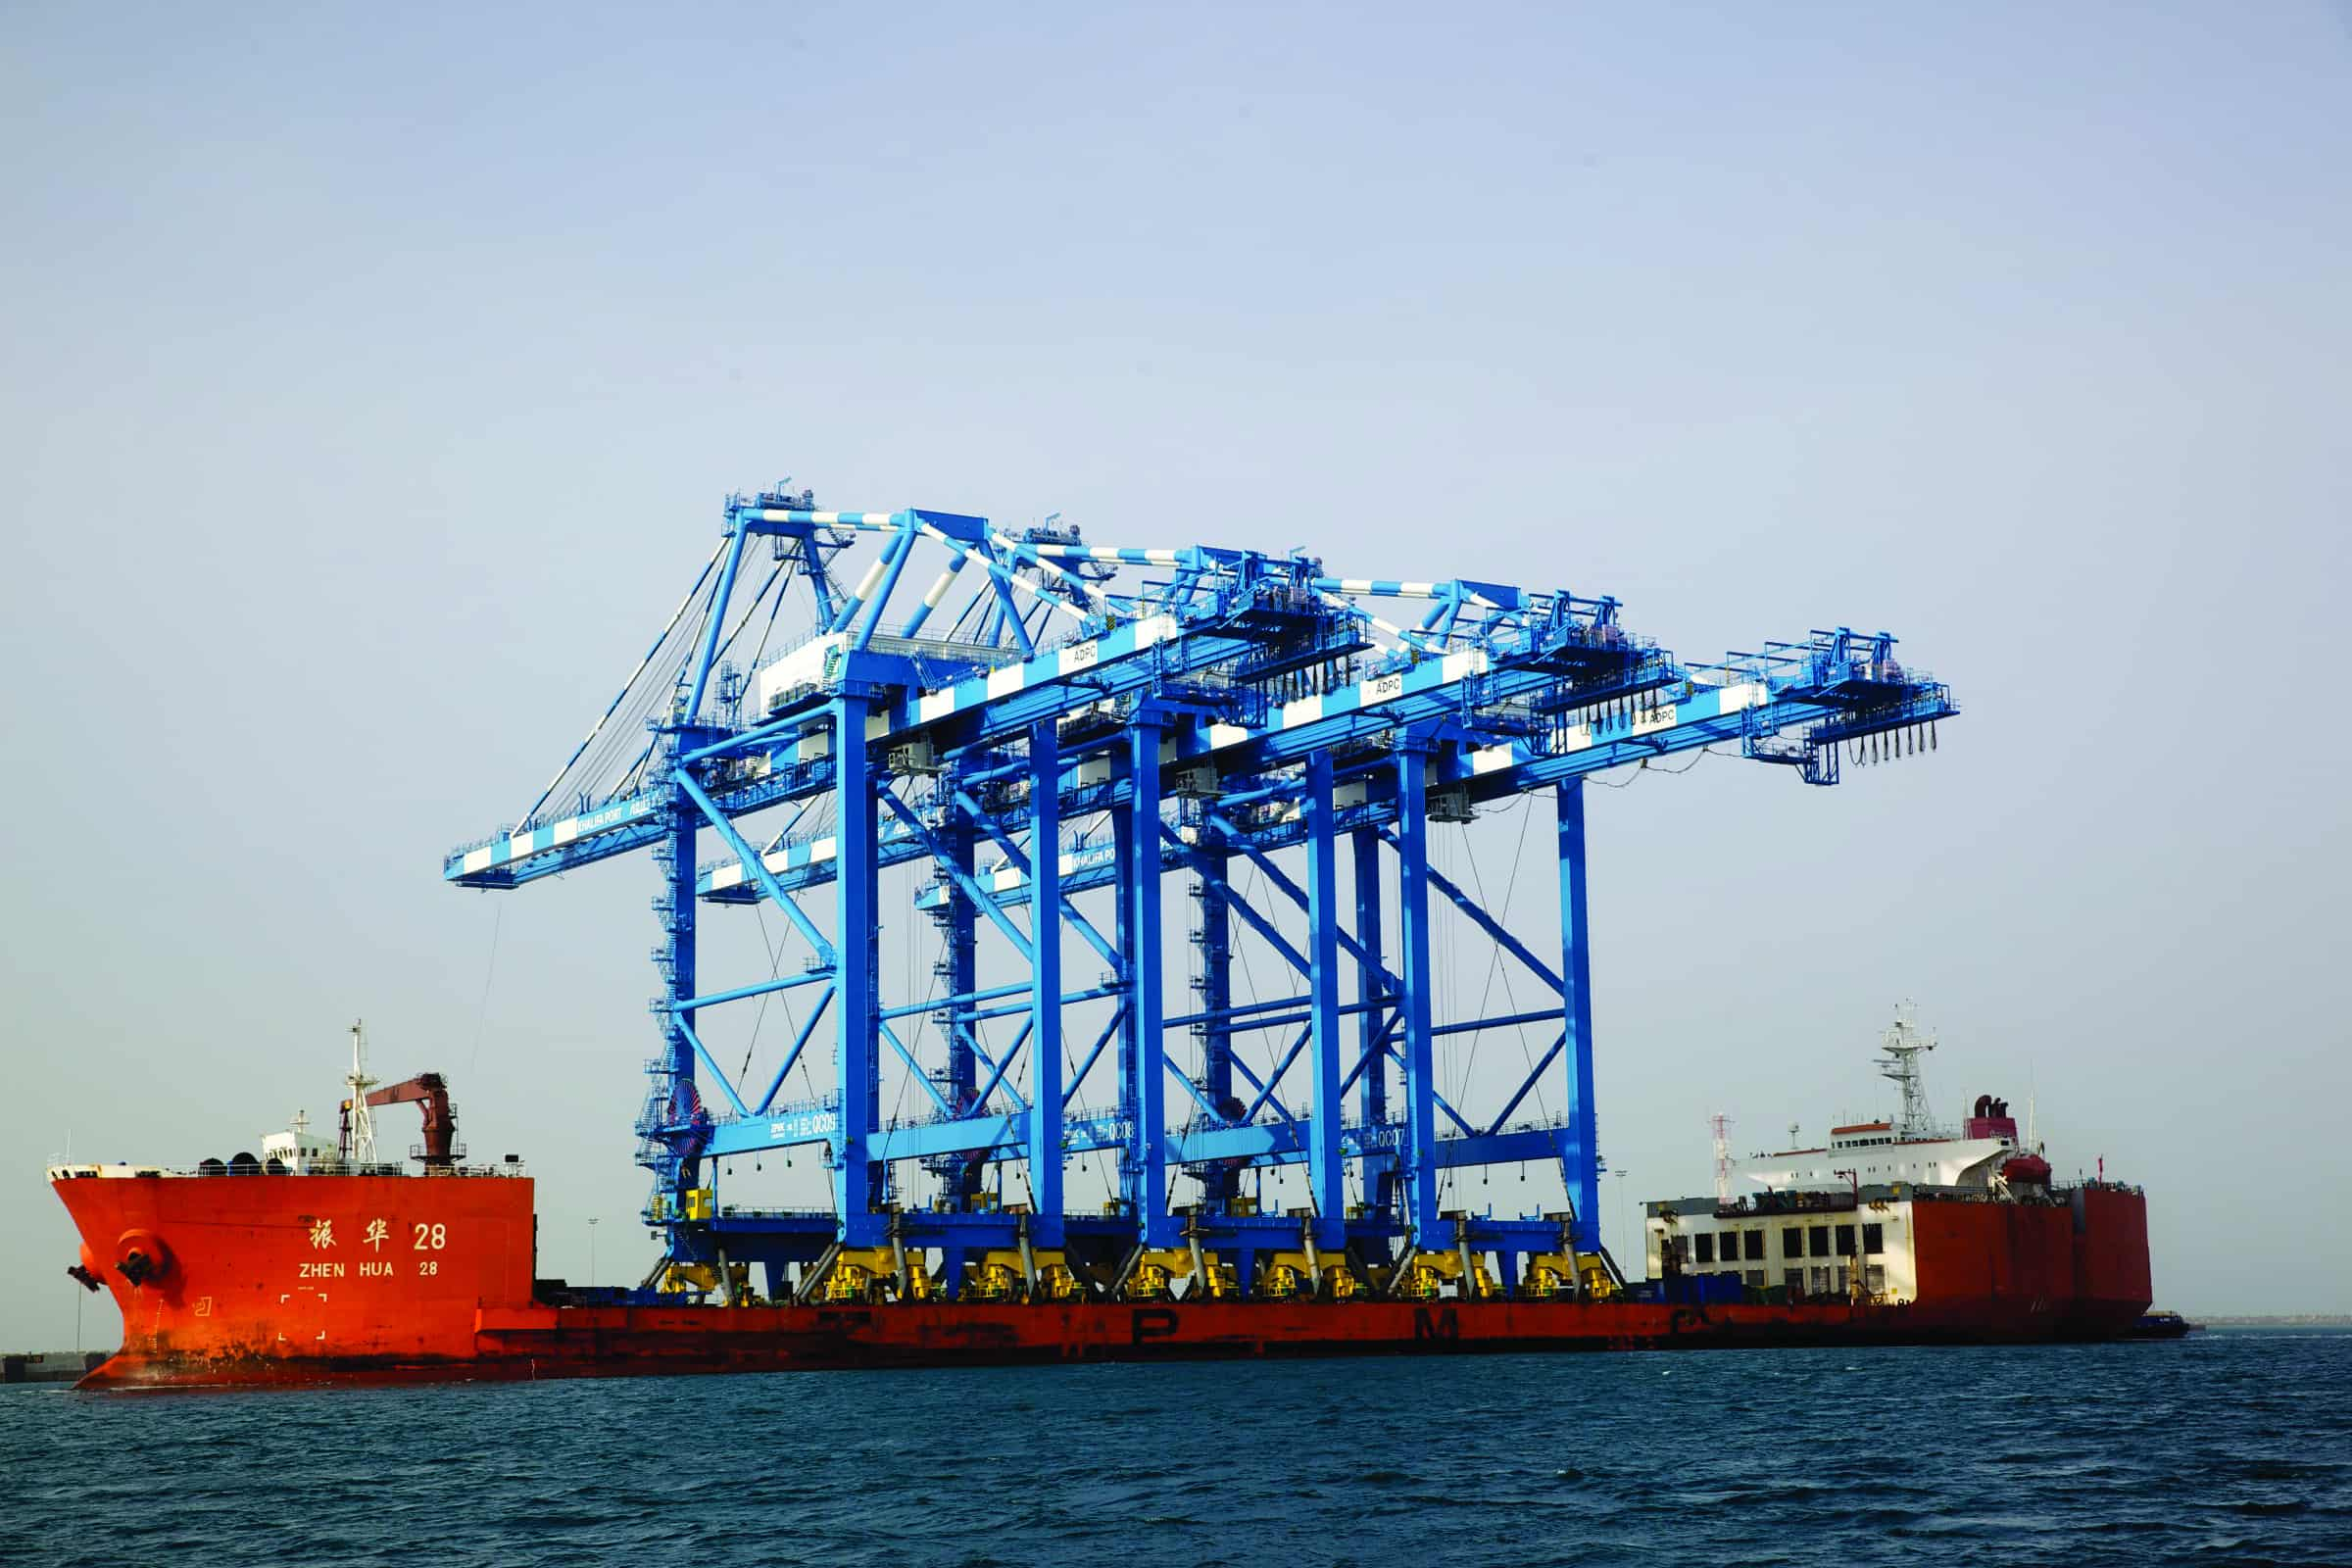 Khalifa welcomes three of the world's largest quay cranes